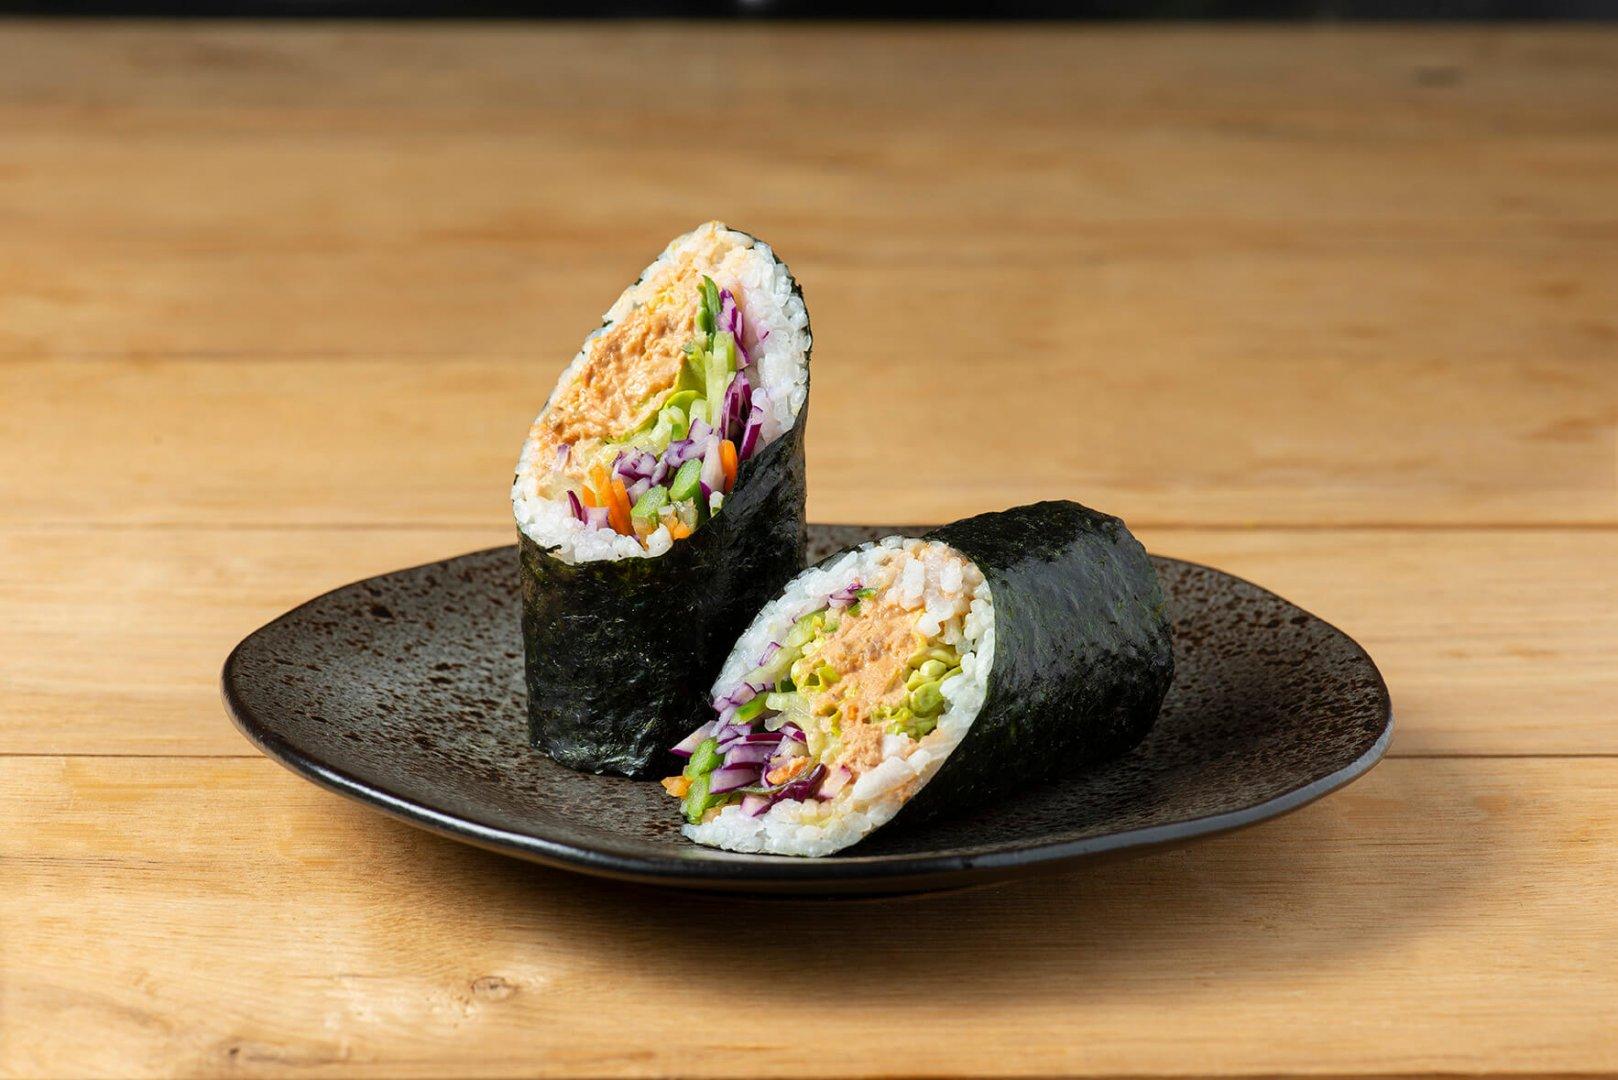 Sushiwrap Tonijnsalade